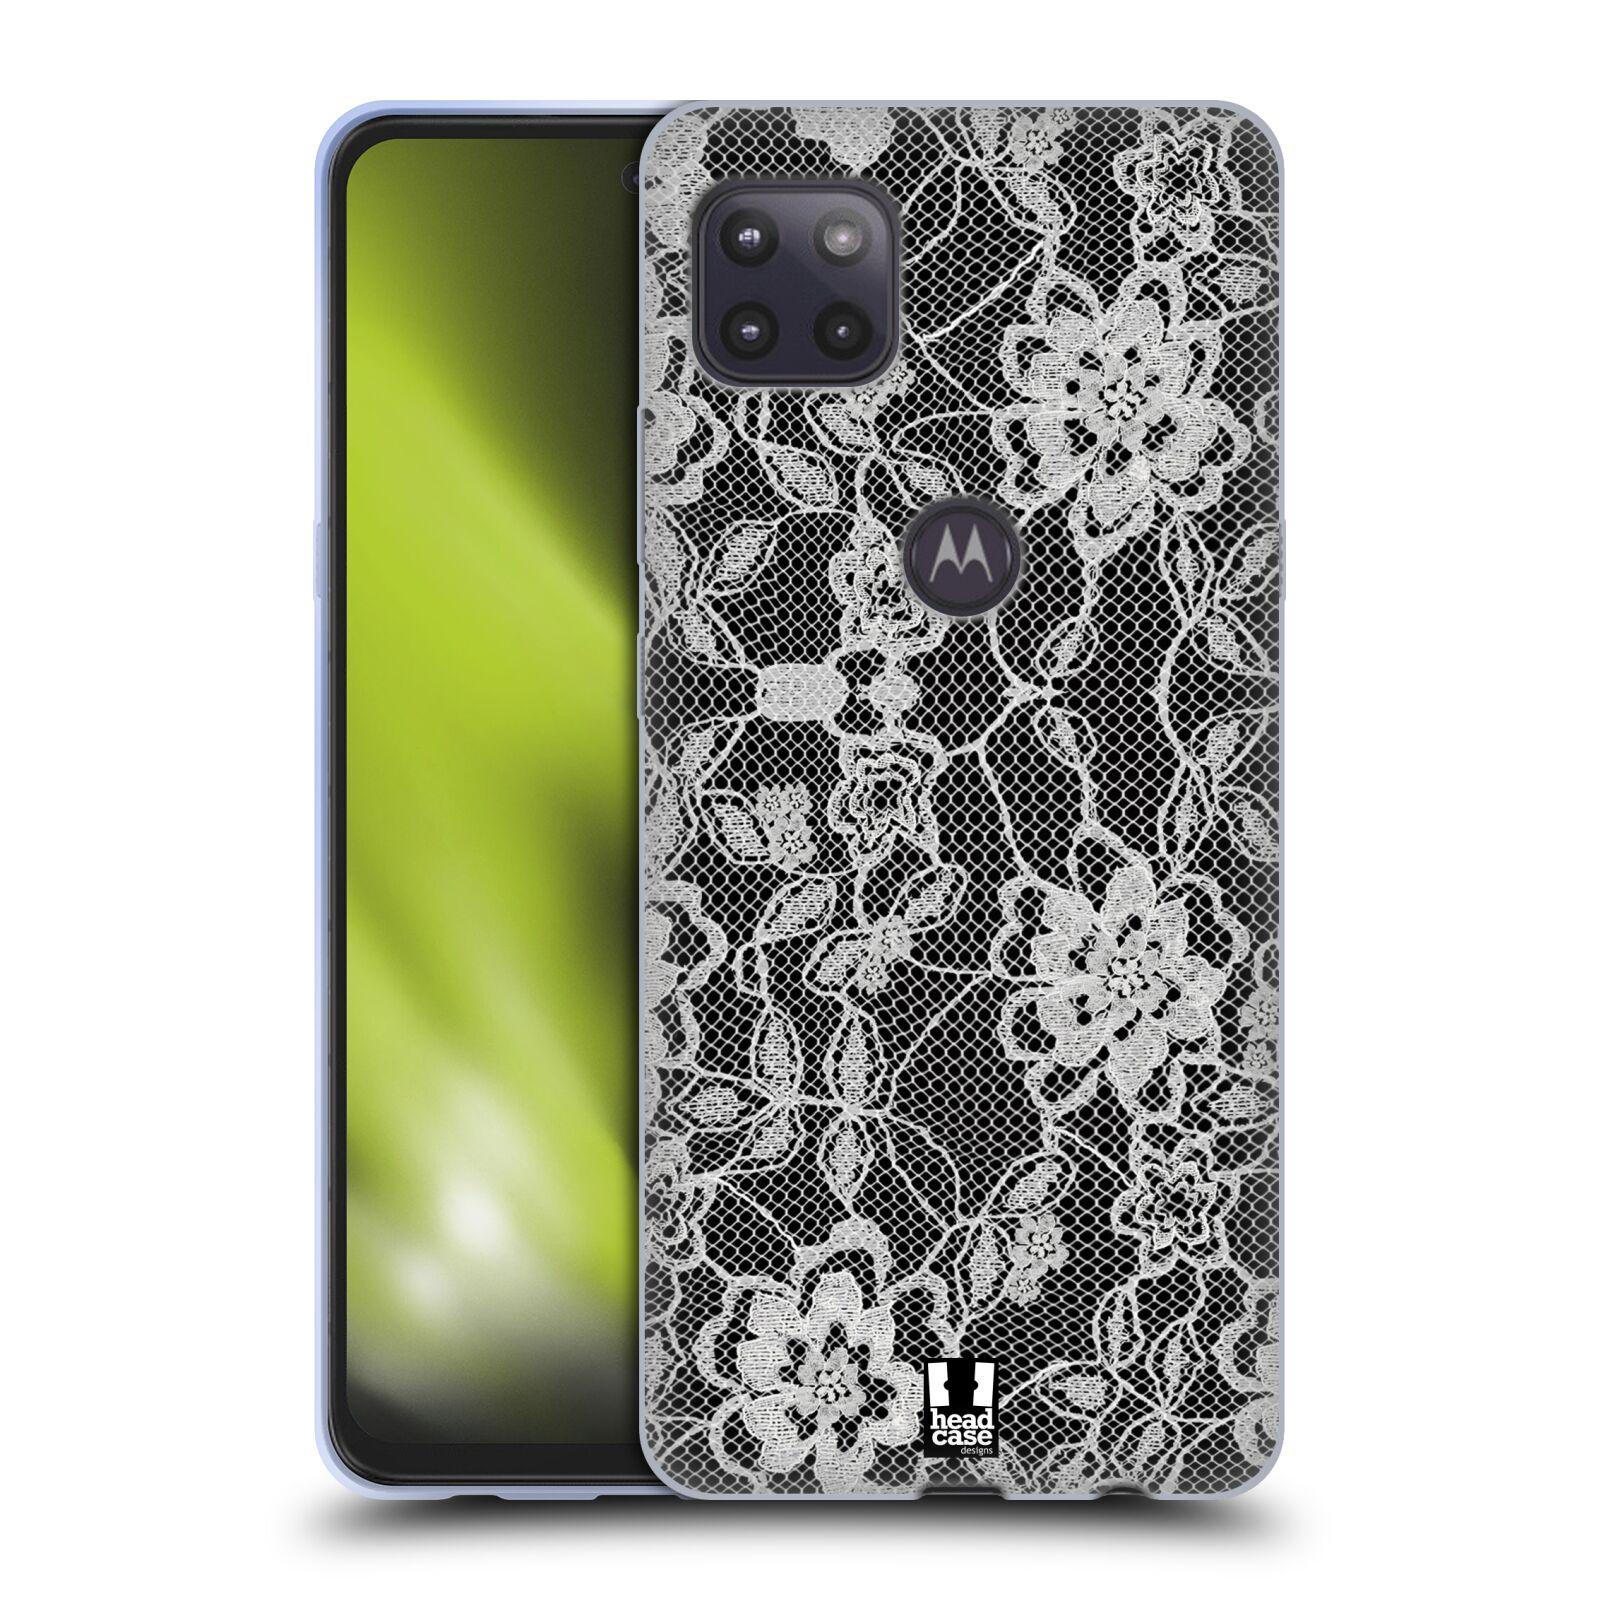 Silikonové pouzdro na mobil Motorola Moto G 5G - Head Case - FLOWERY KRAJKA